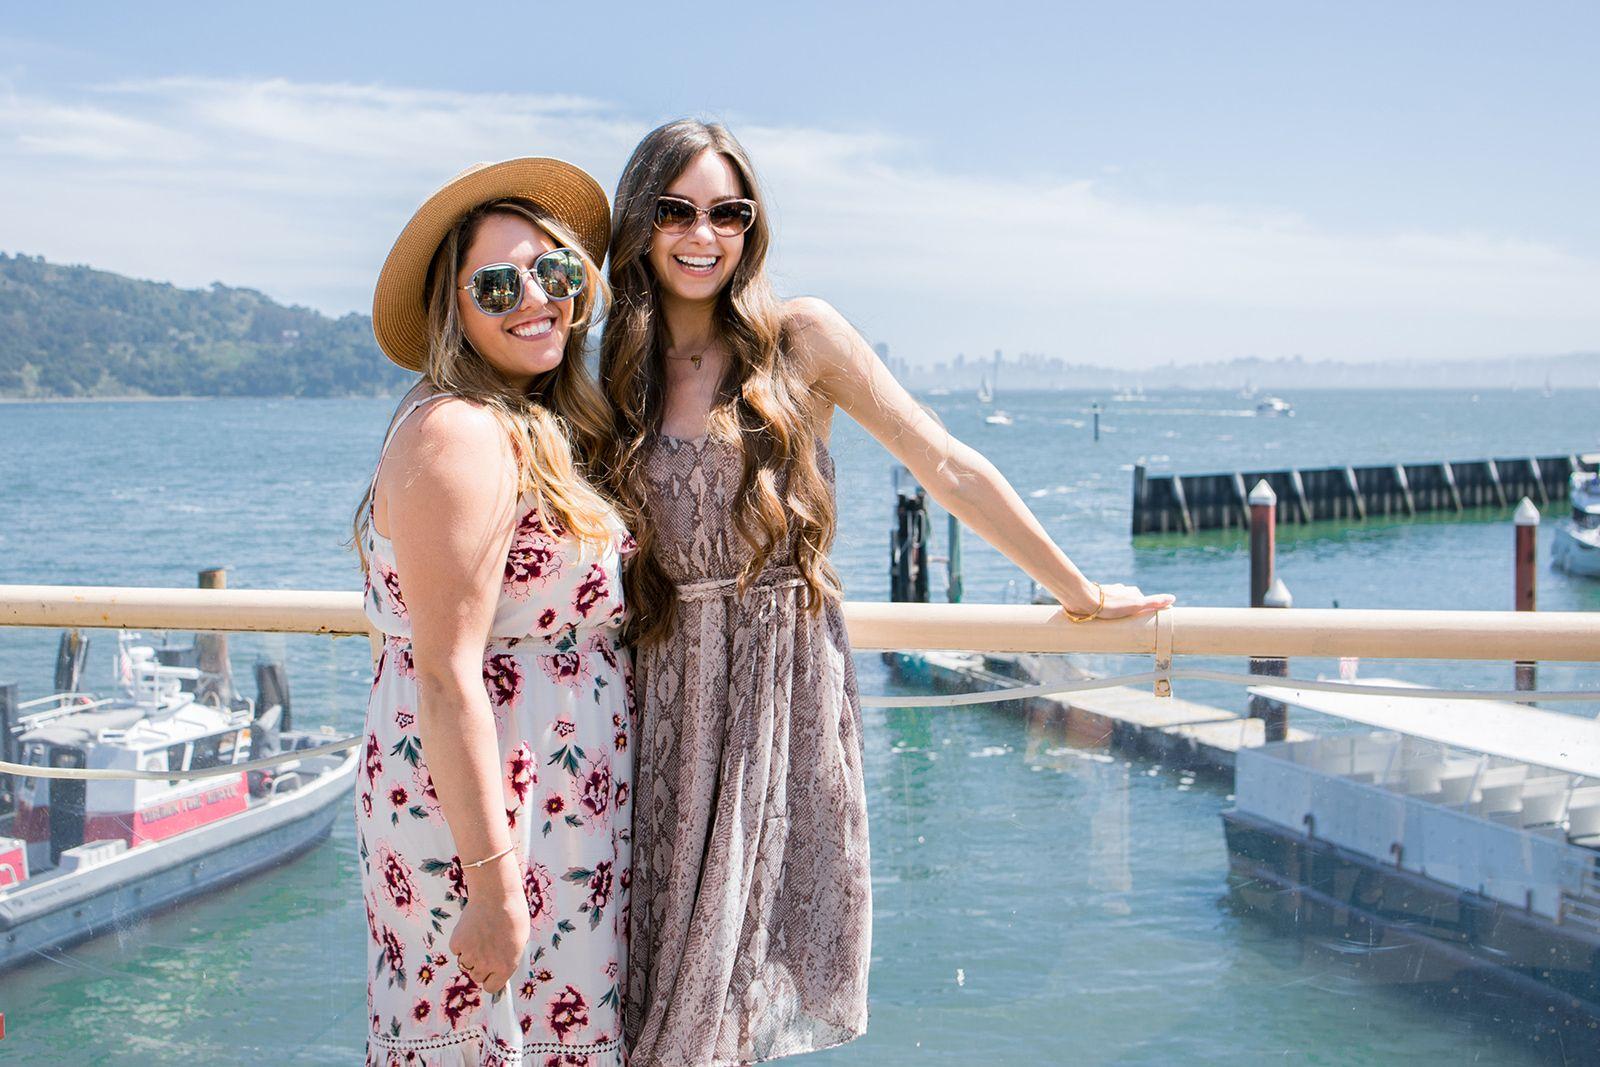 Guests enjoying the Tiburon Waterfront at Servino